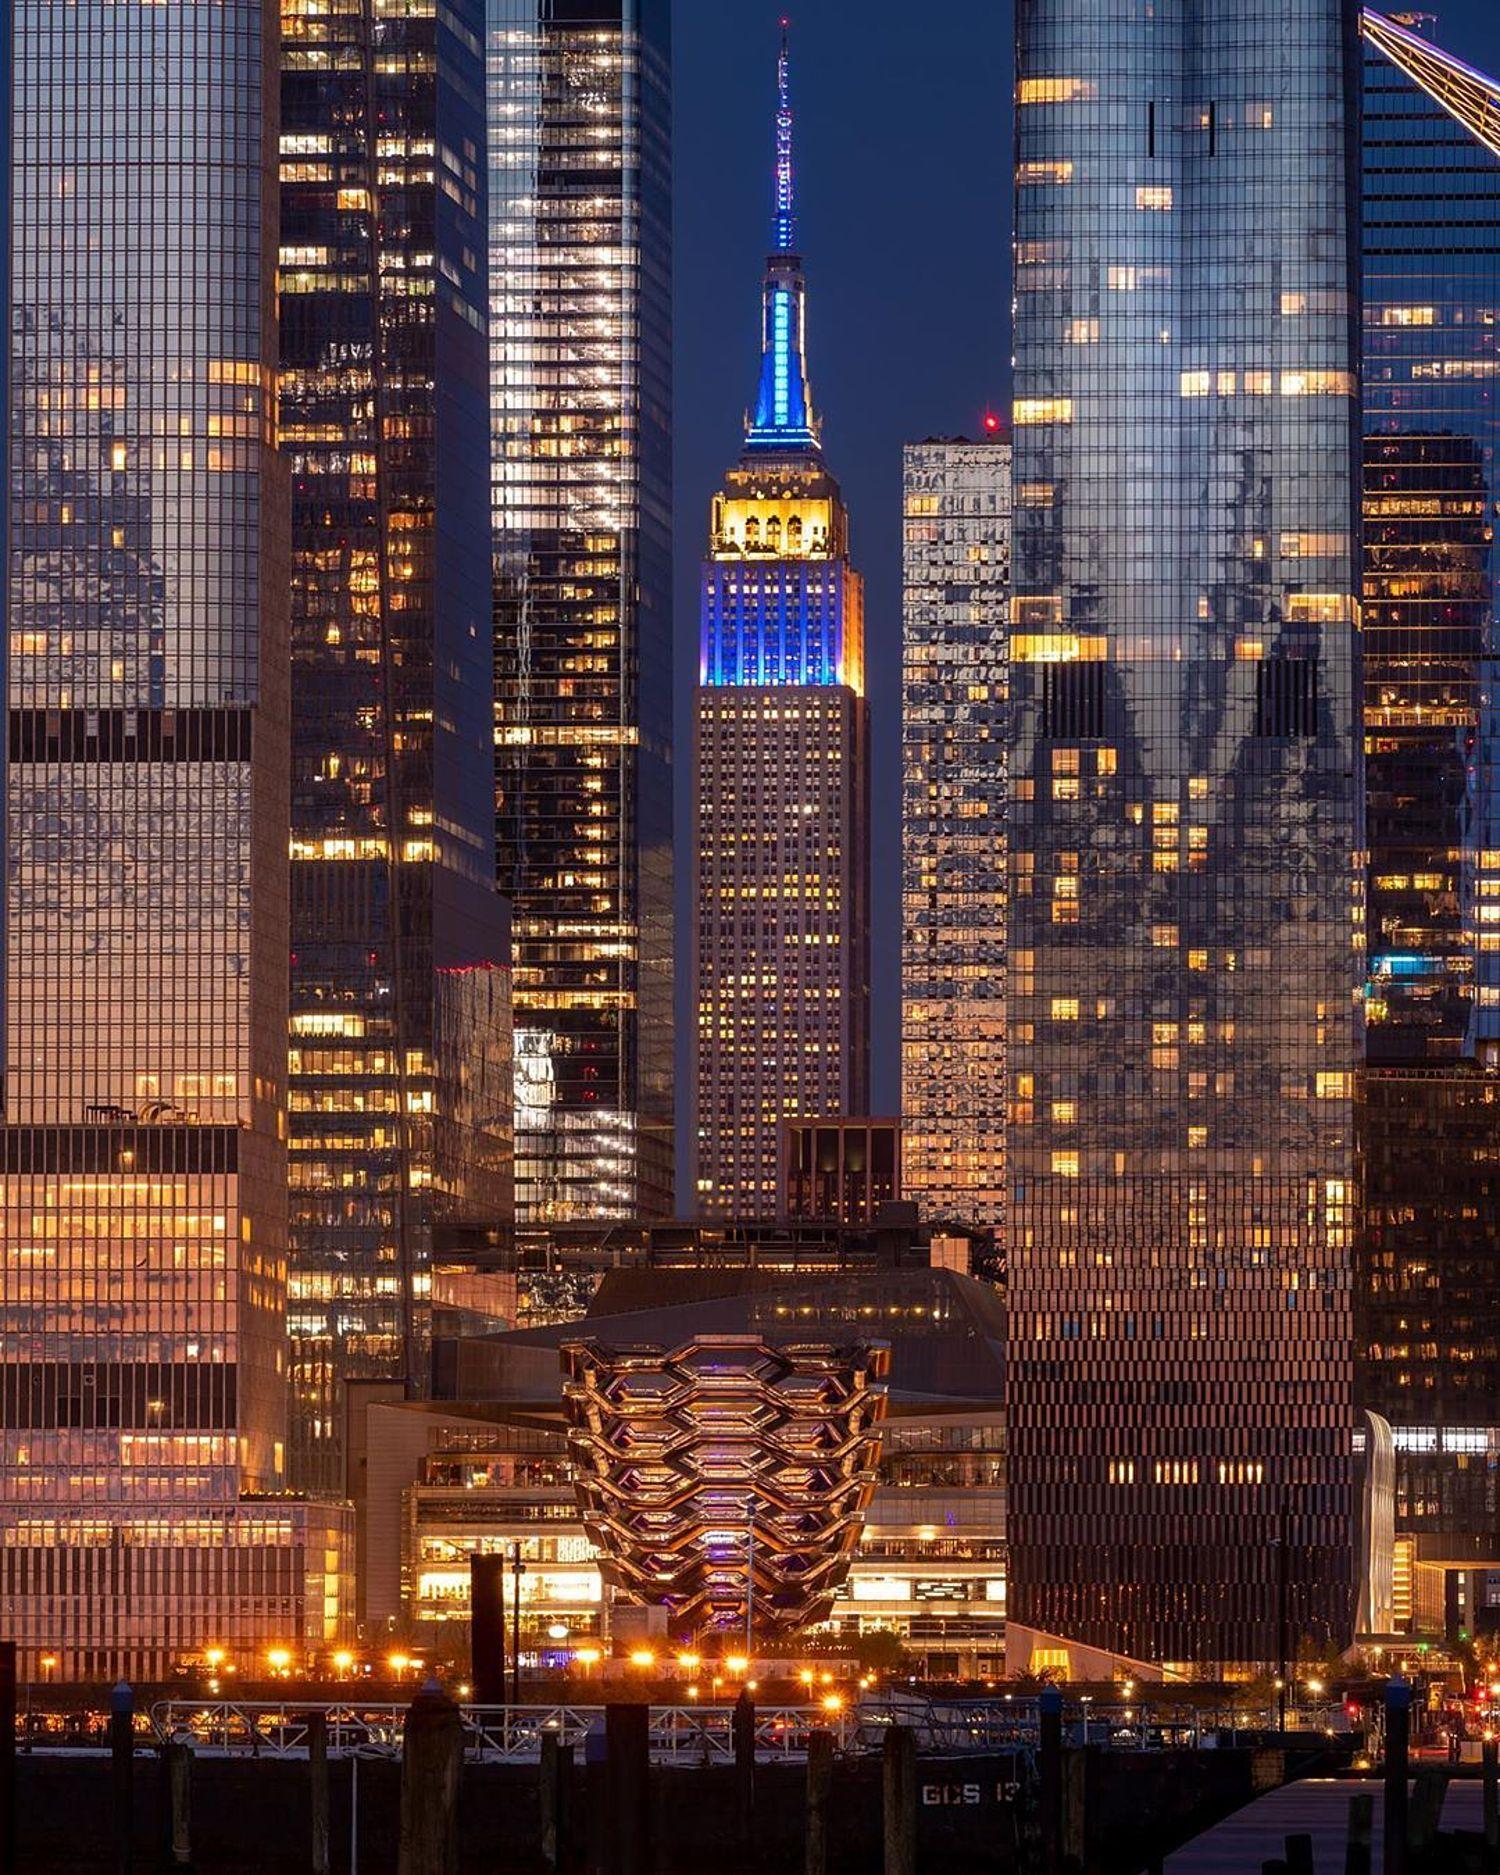 """Empire State Building vs The Vessel"" #newyorkcity #nycprimeshot #iloveny #nycpassion #ilovenewyork #buildingstylesgf #nybynewyorkers  #instagramnyc #iheartnewyorkny #bestofnewyork #lovenyc #photowall #photooftheday #postcardsfromtheworld #imagesofnyc #insta_america #vibrant_globe #the_visionaries #myCity_life #Jaw_dropping_shotz #Splendidshots #Photowall #Hot_shotz #NBC4NY #what_i_saw_in_nyc"